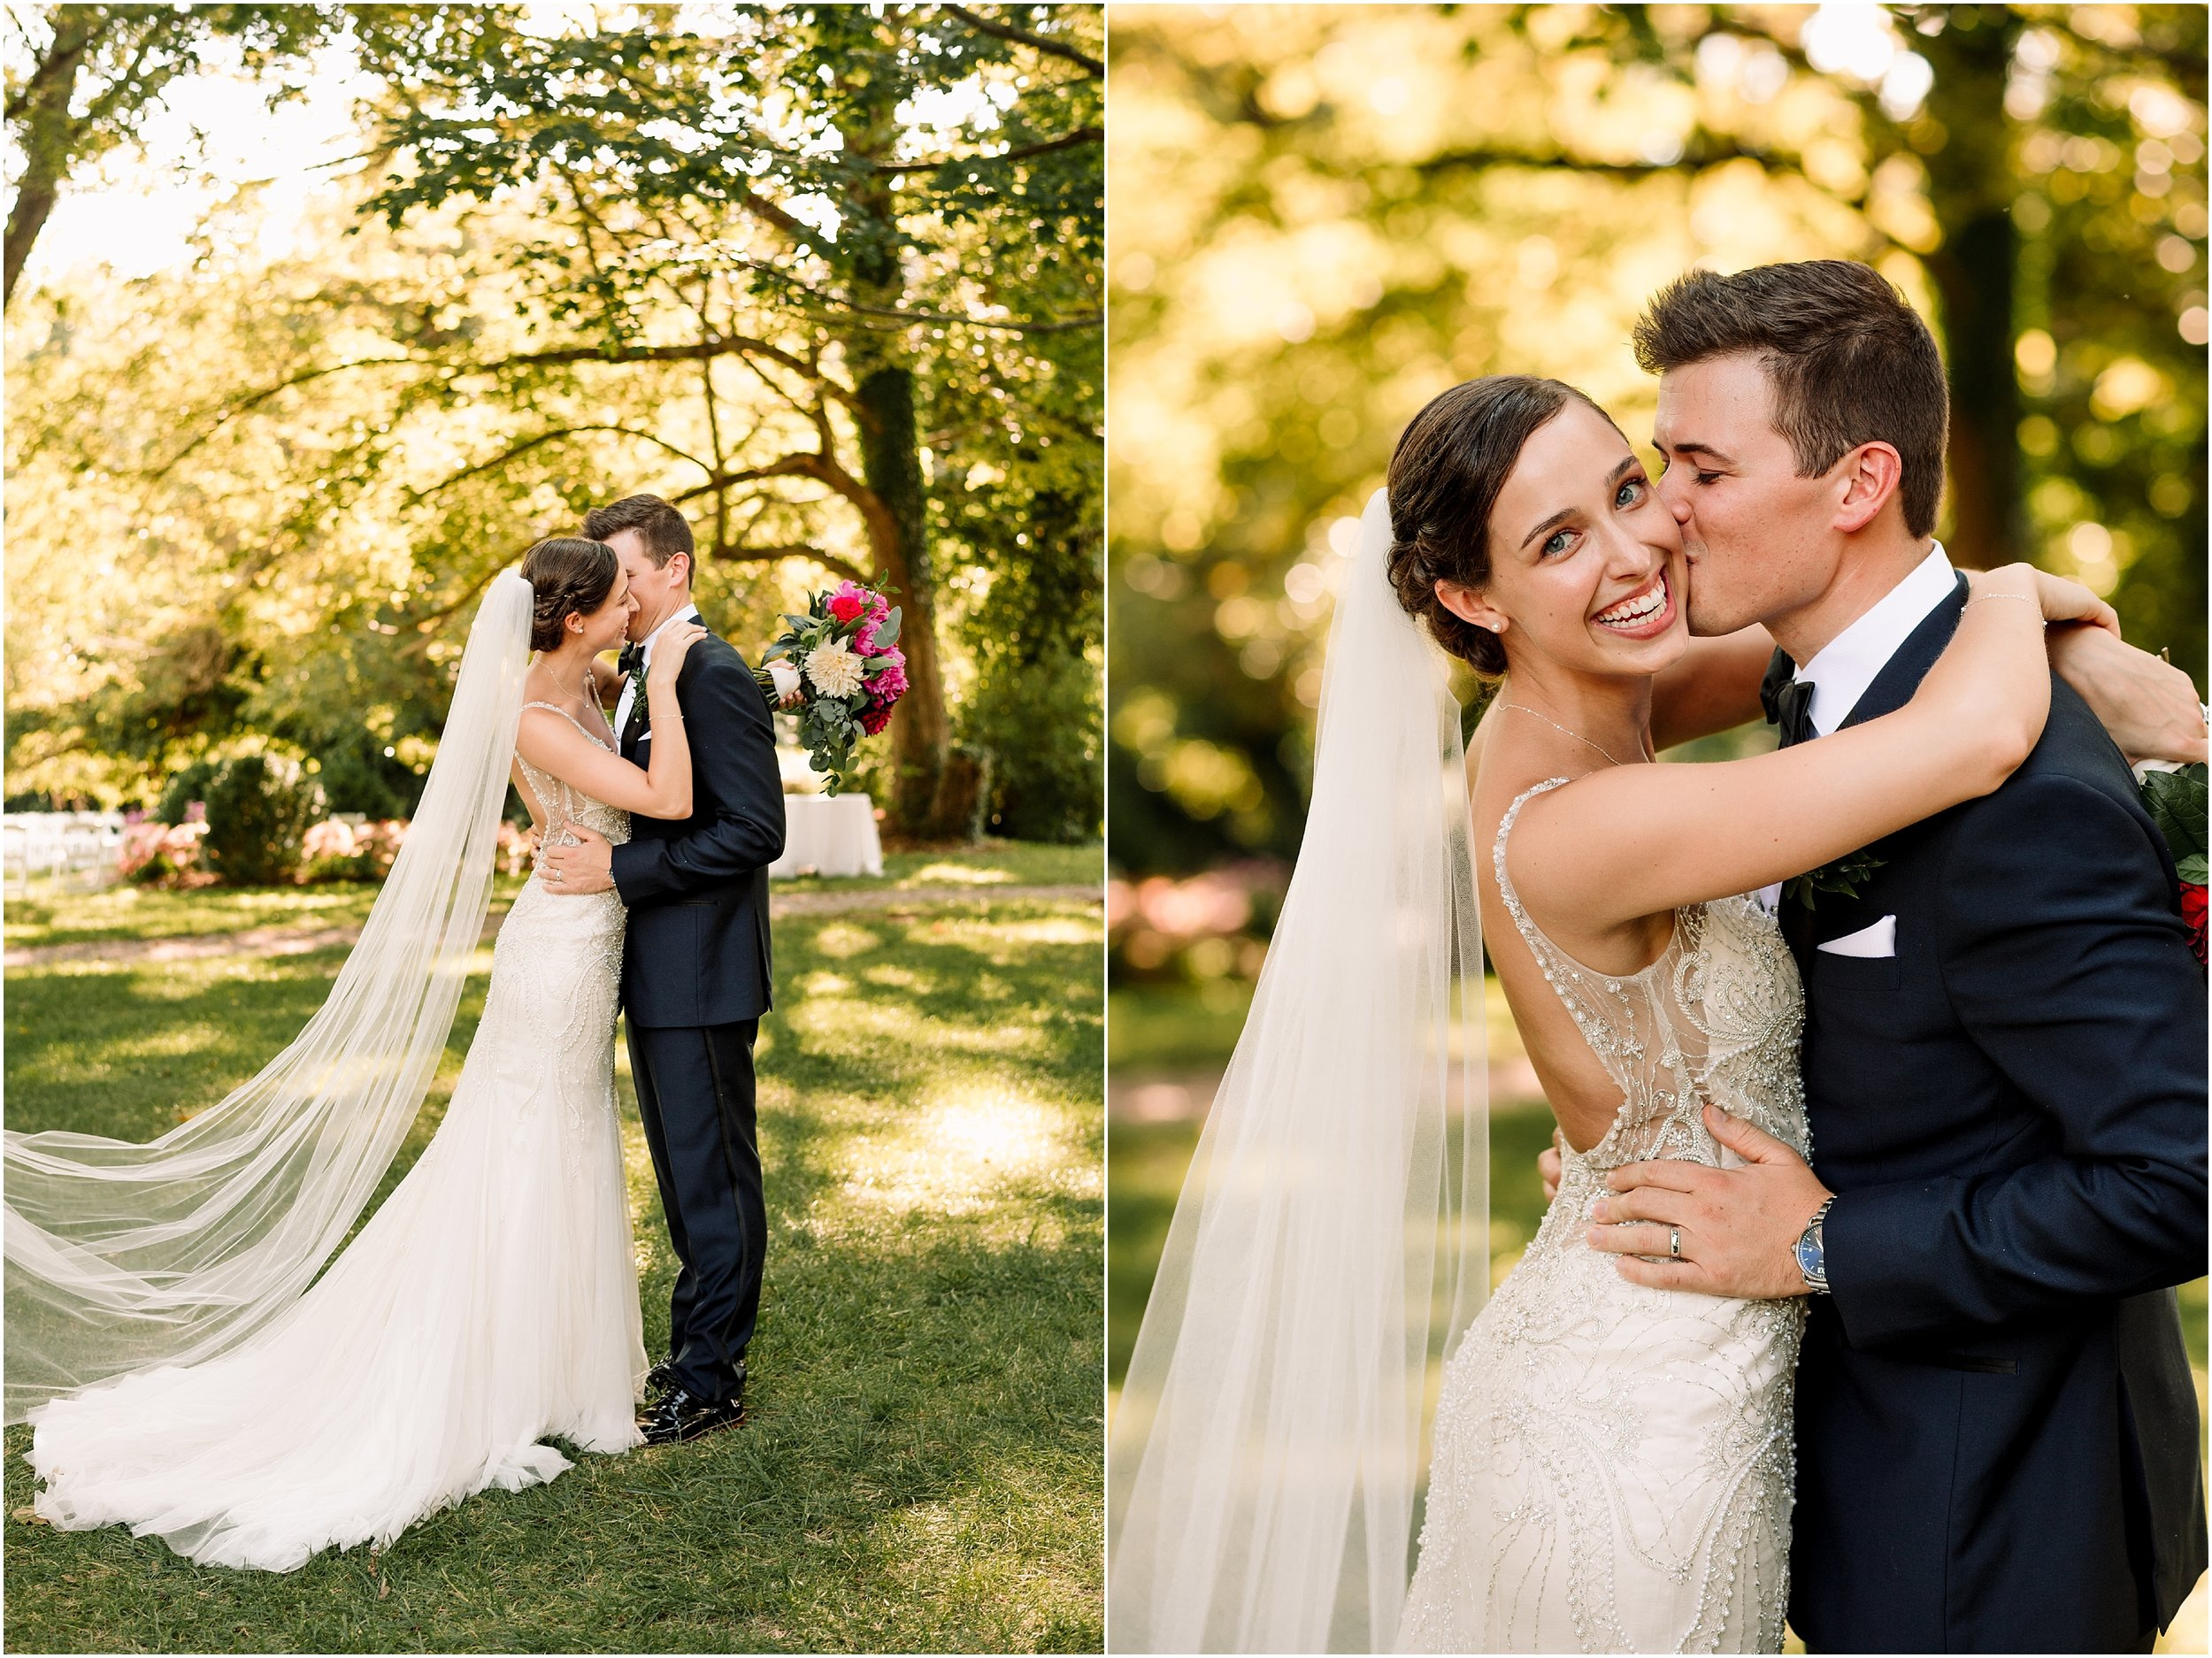 hannah leigh photography Antrim 1844 Wedding_1221.jpg